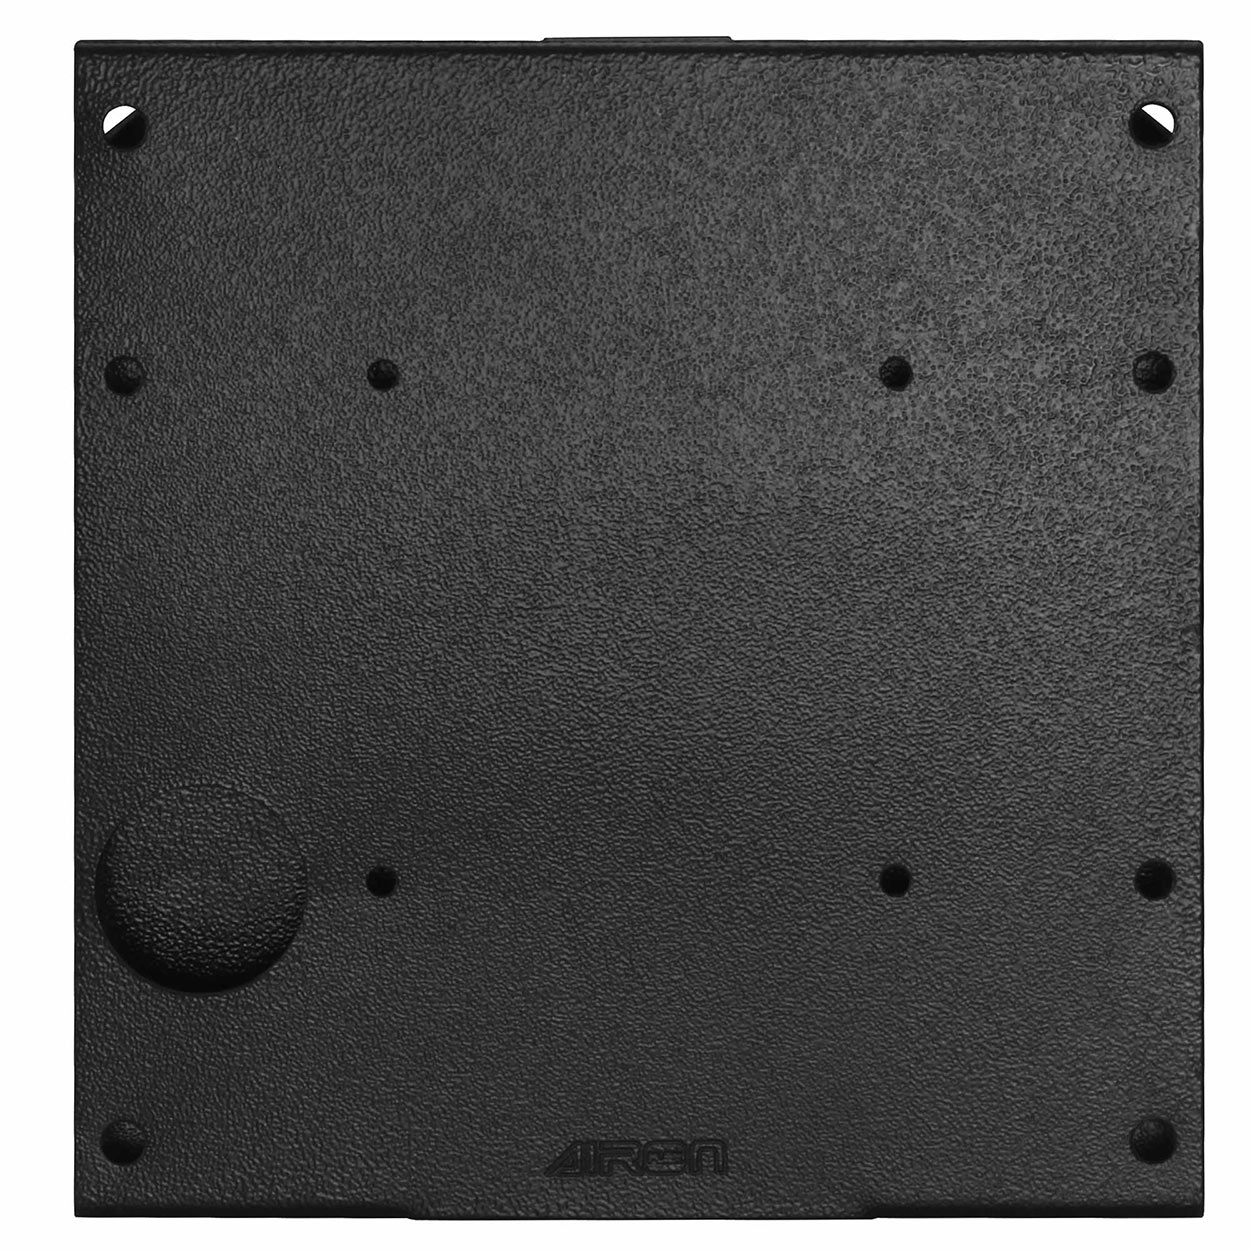 WALL S F 35 V22 BLACK (HDMI ARC)